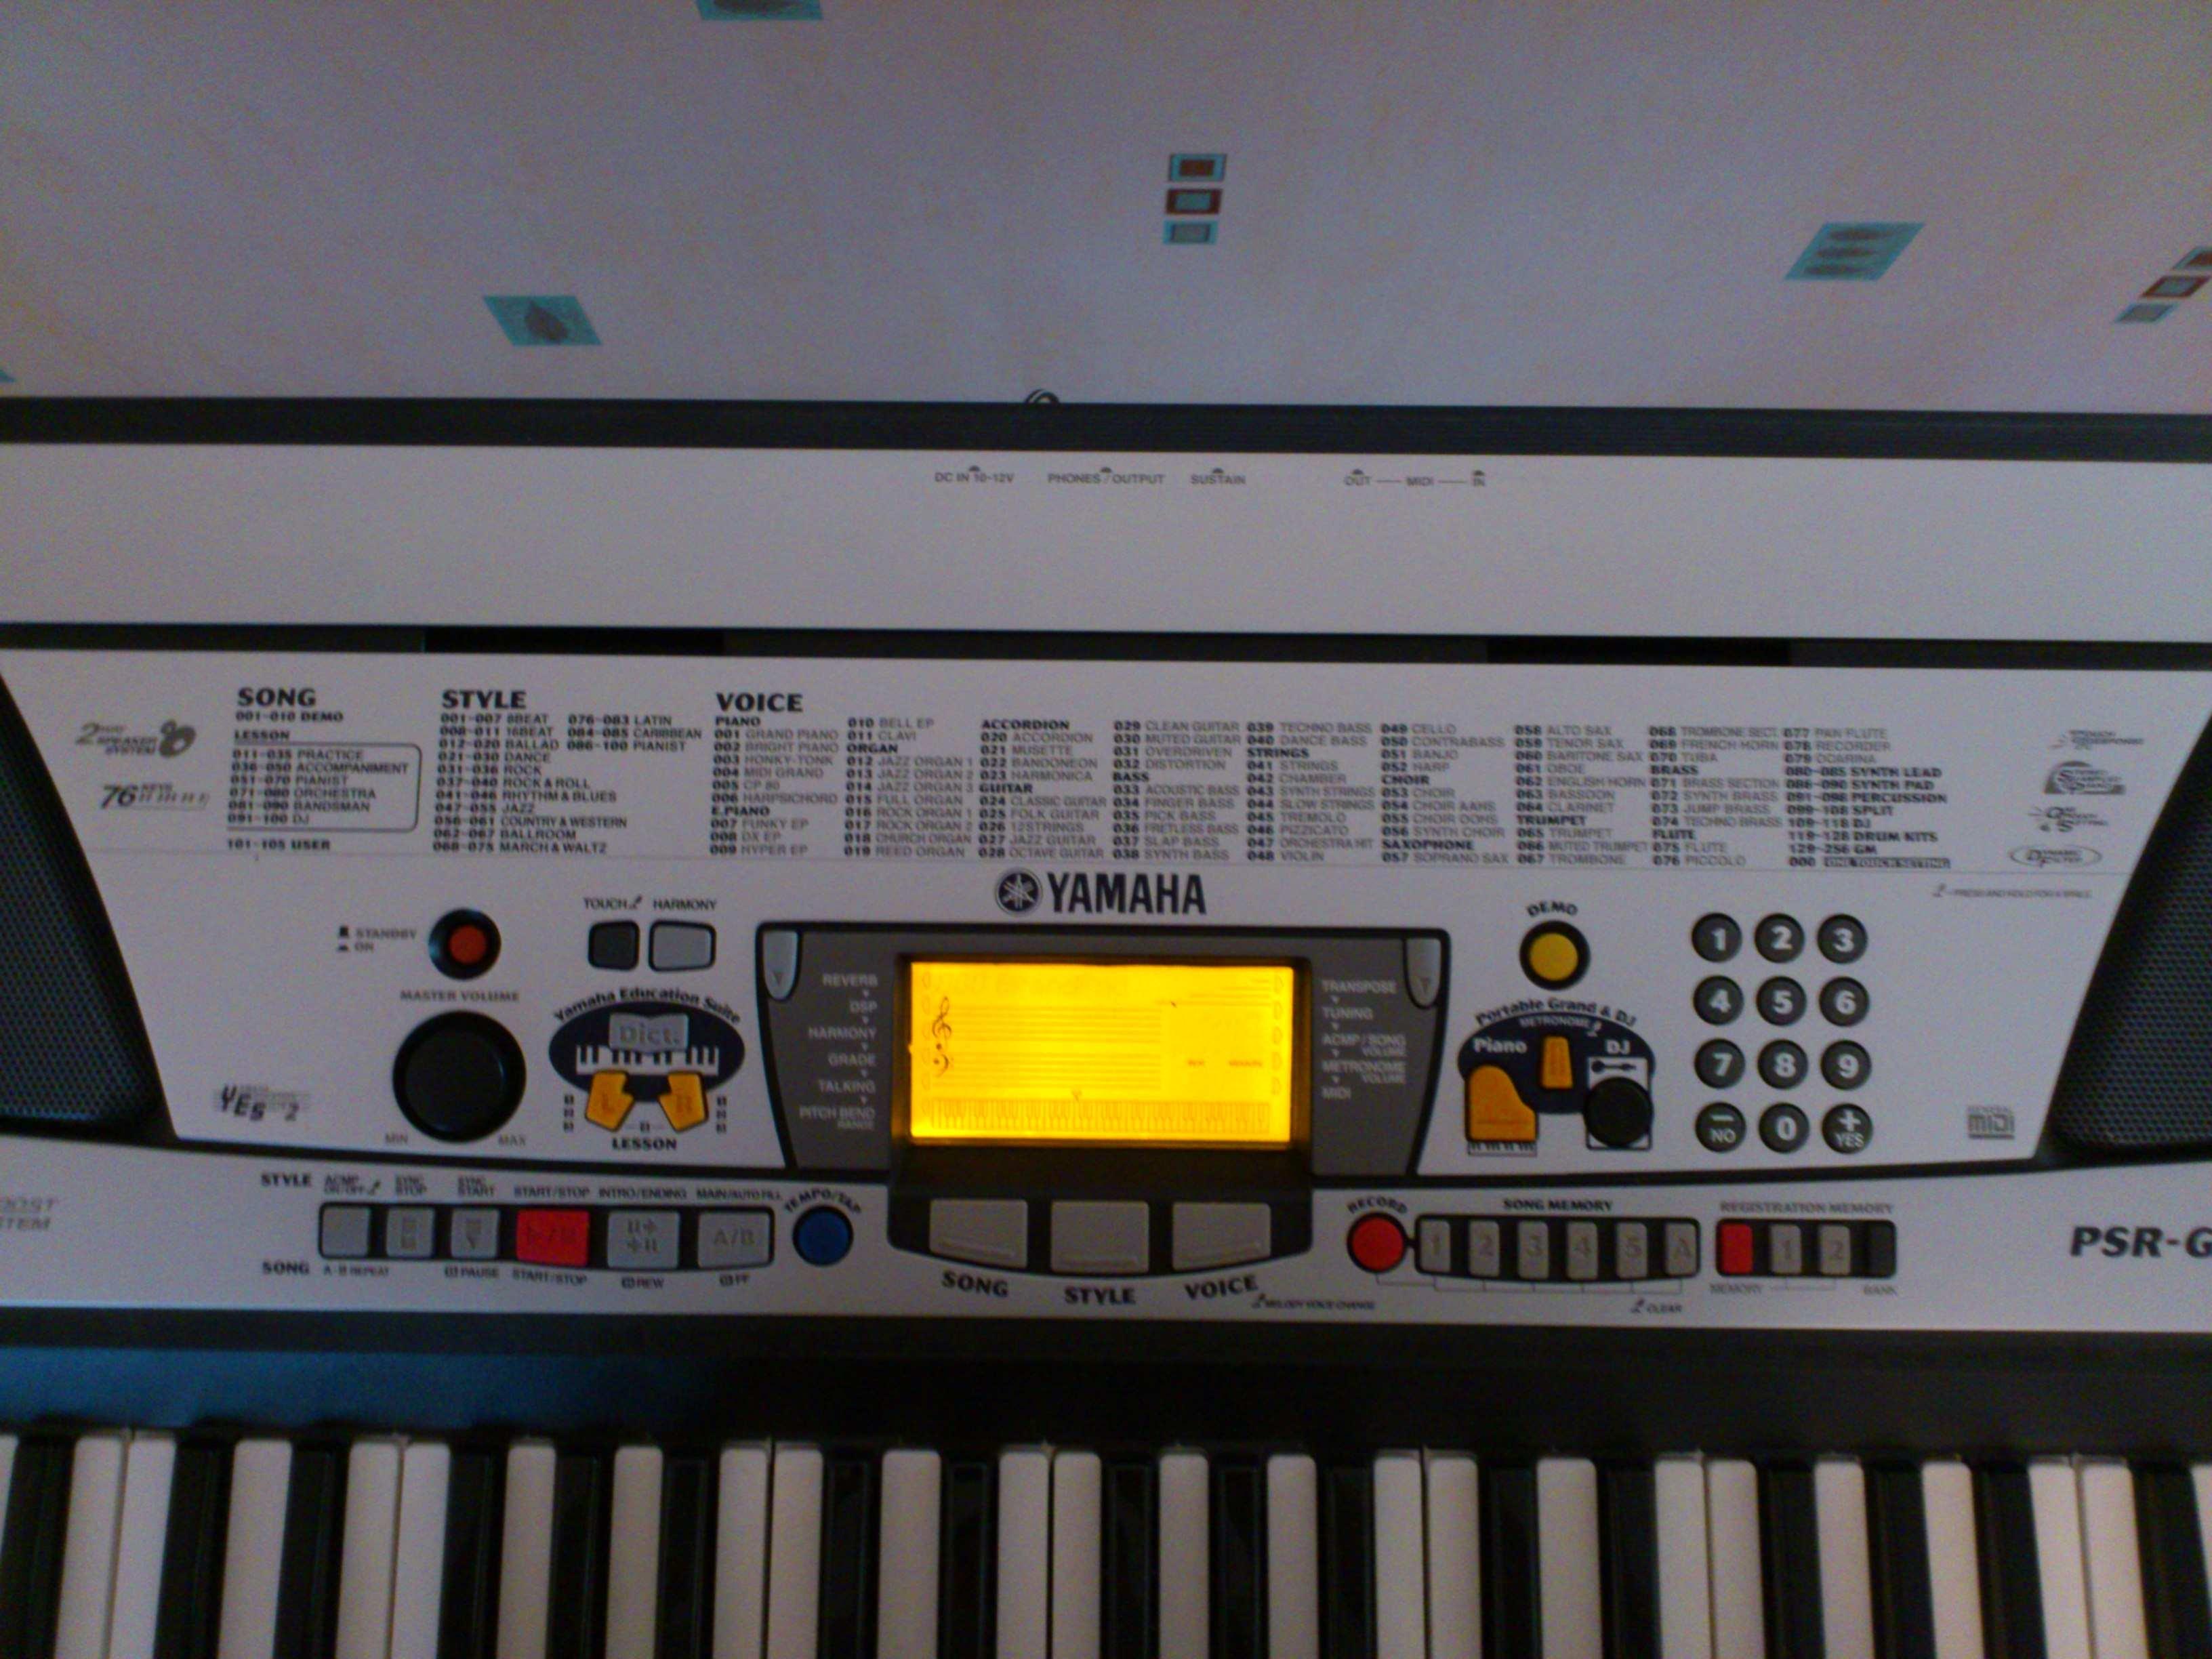 yamaha psr gx76 image 552500 audiofanzine rh en audiofanzine com Yamaha PSR Series yamaha psr-gx76 manuel